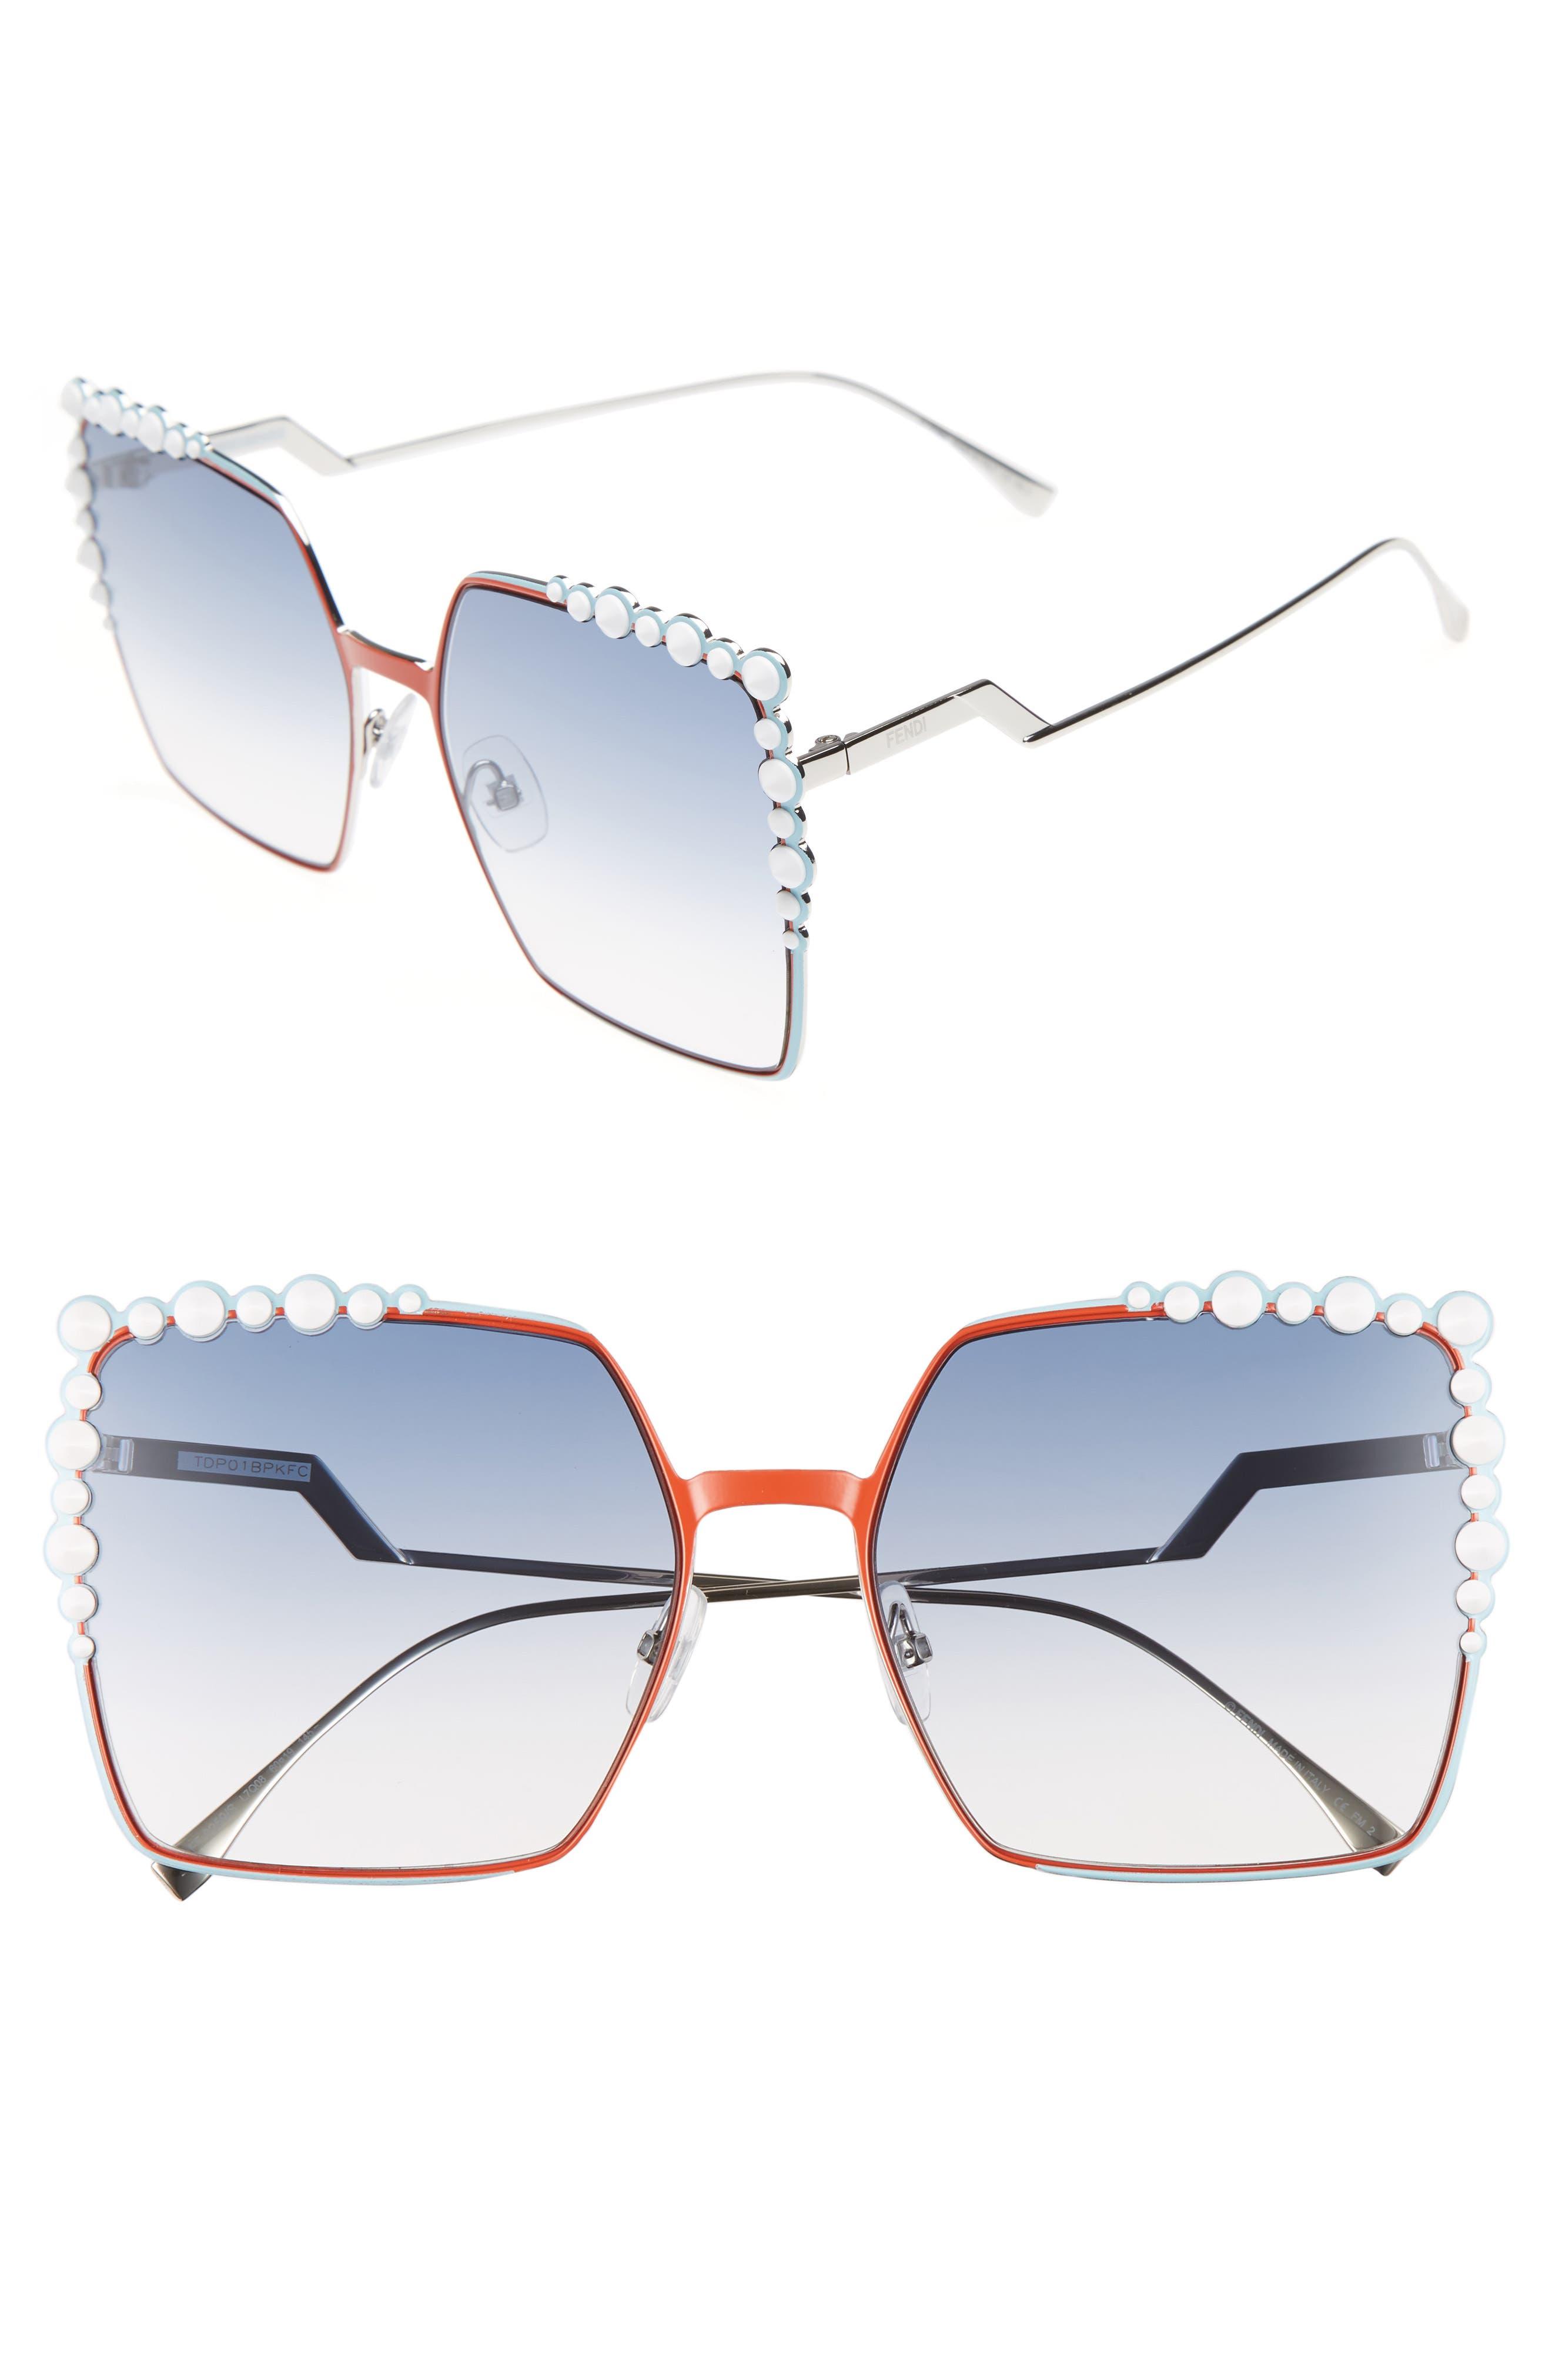 60mm Gradient Square Cat Eye Sunglasses,                             Main thumbnail 1, color,                             Orange